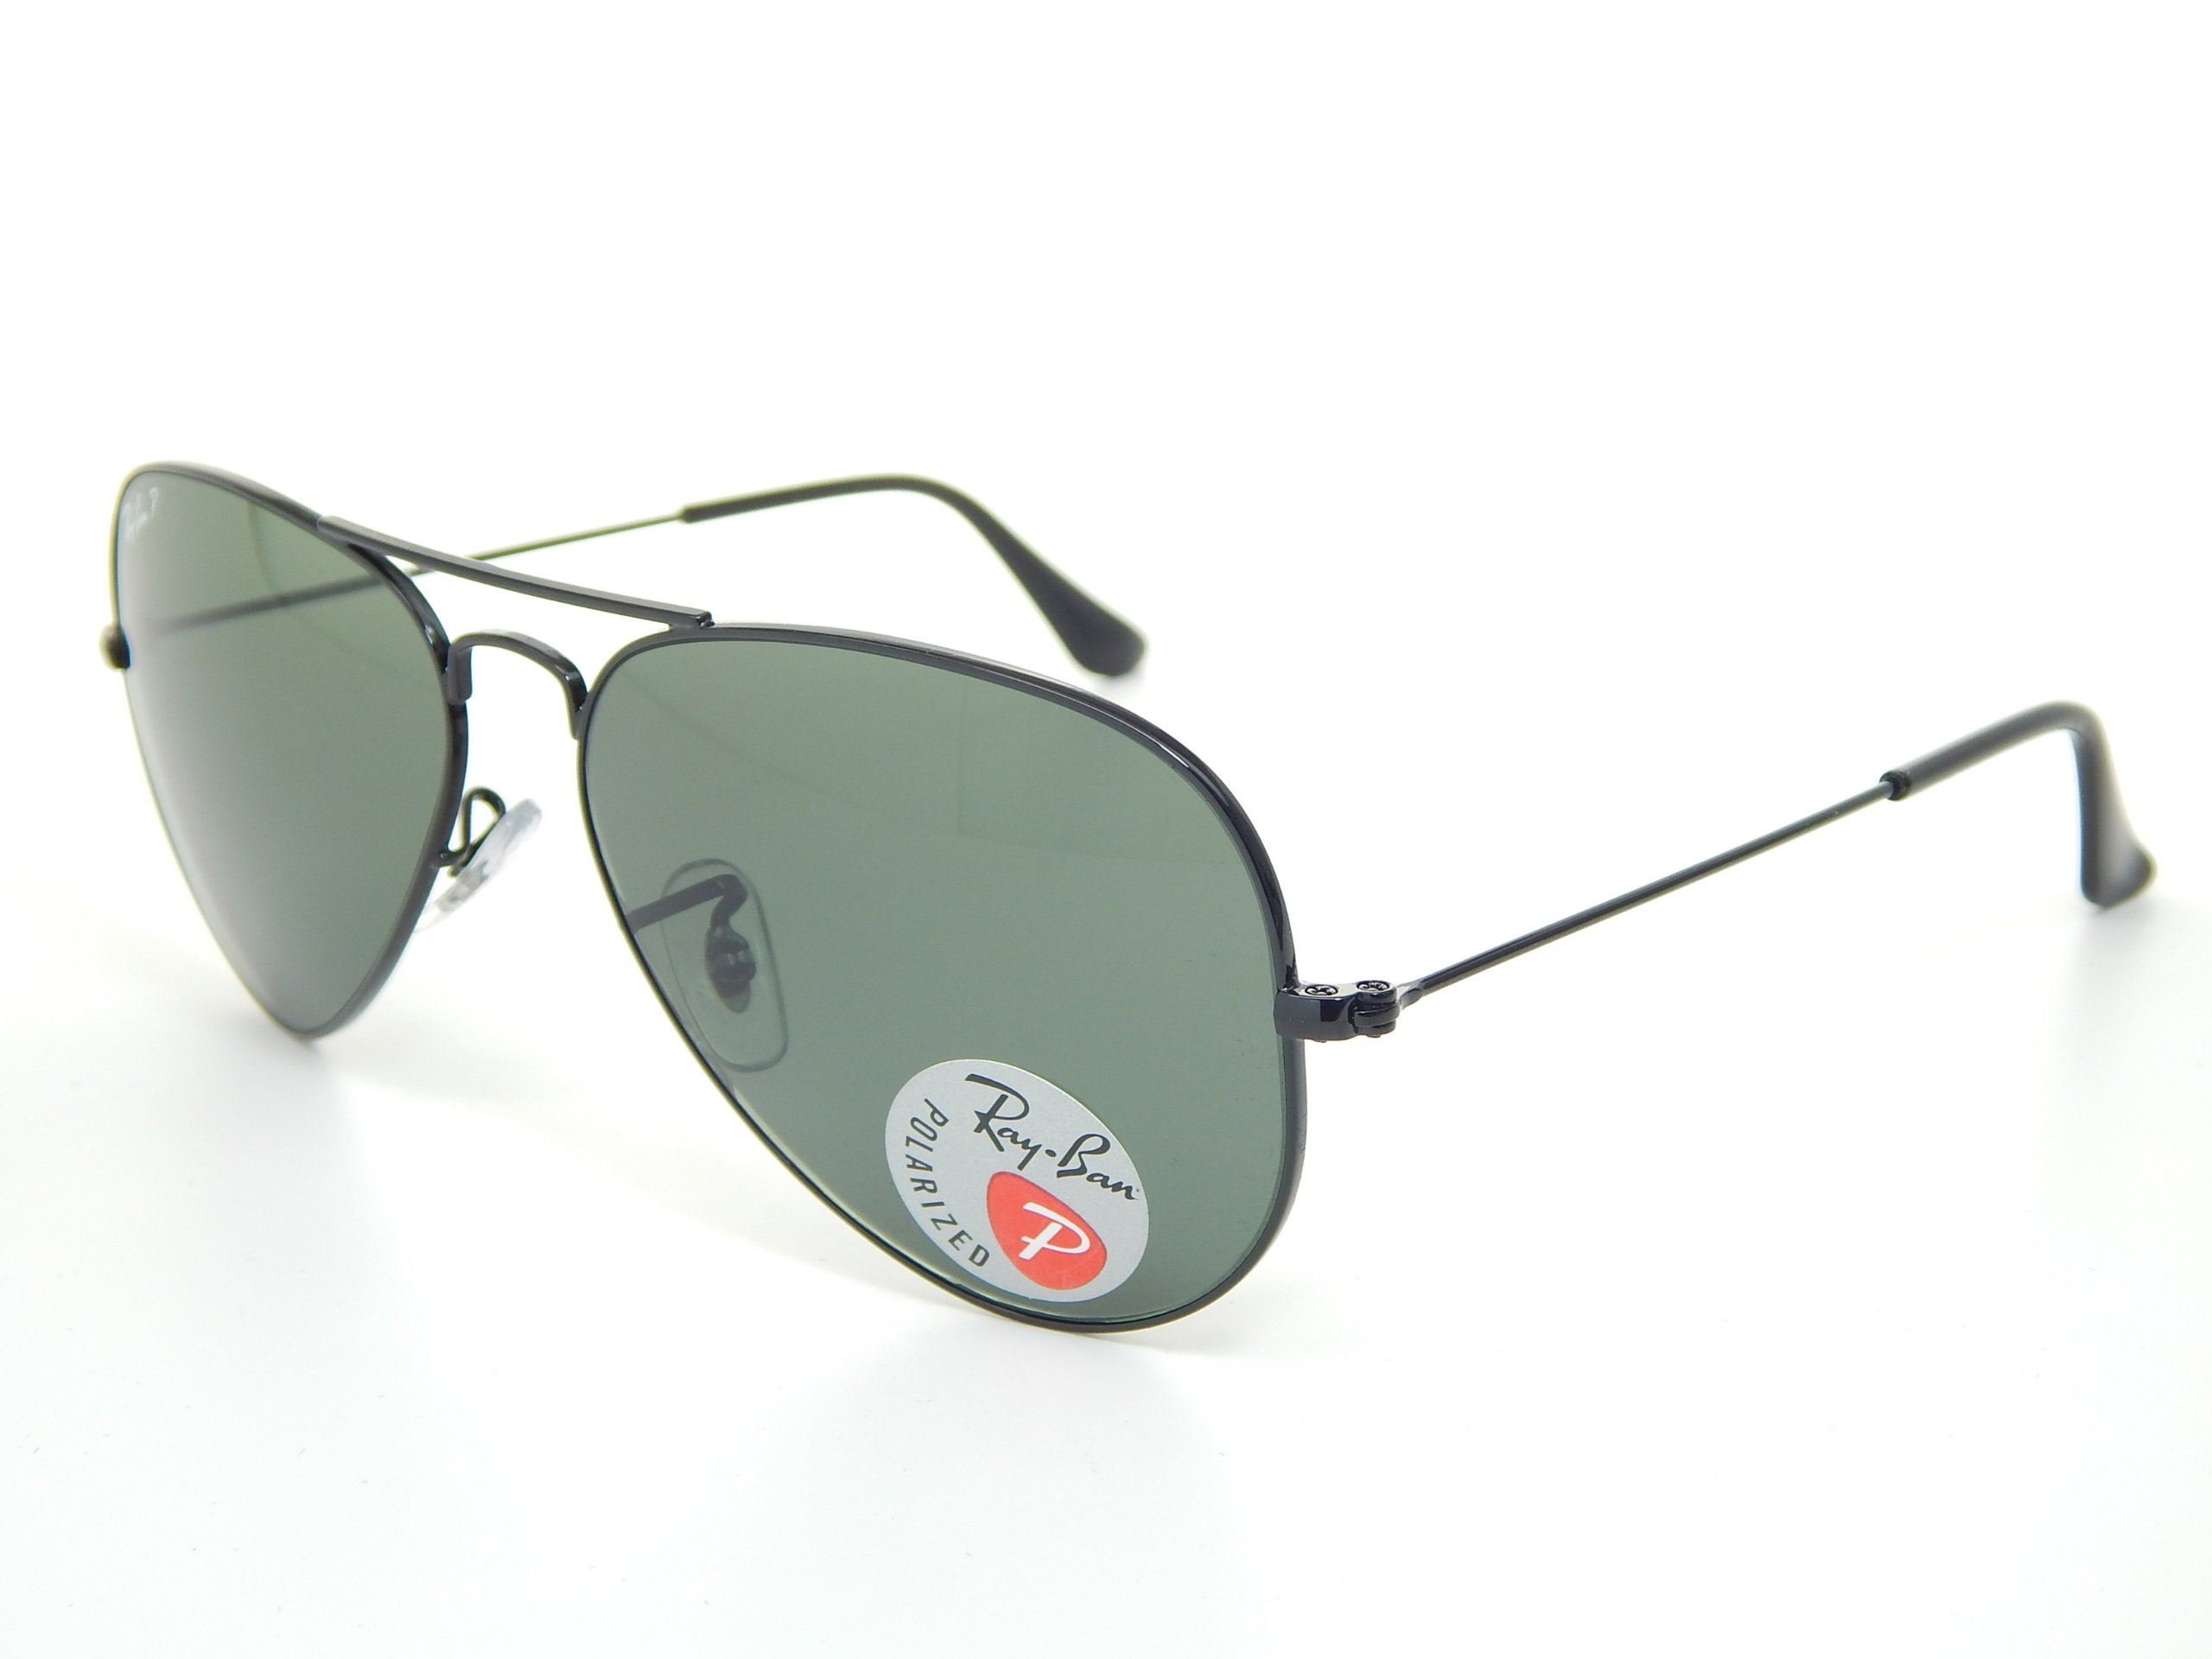 c2b8950844 New Ray Ban RB3025 002 58 Aviator Black G-15 XLT Polarized 55mm Sunglasses  Apparel